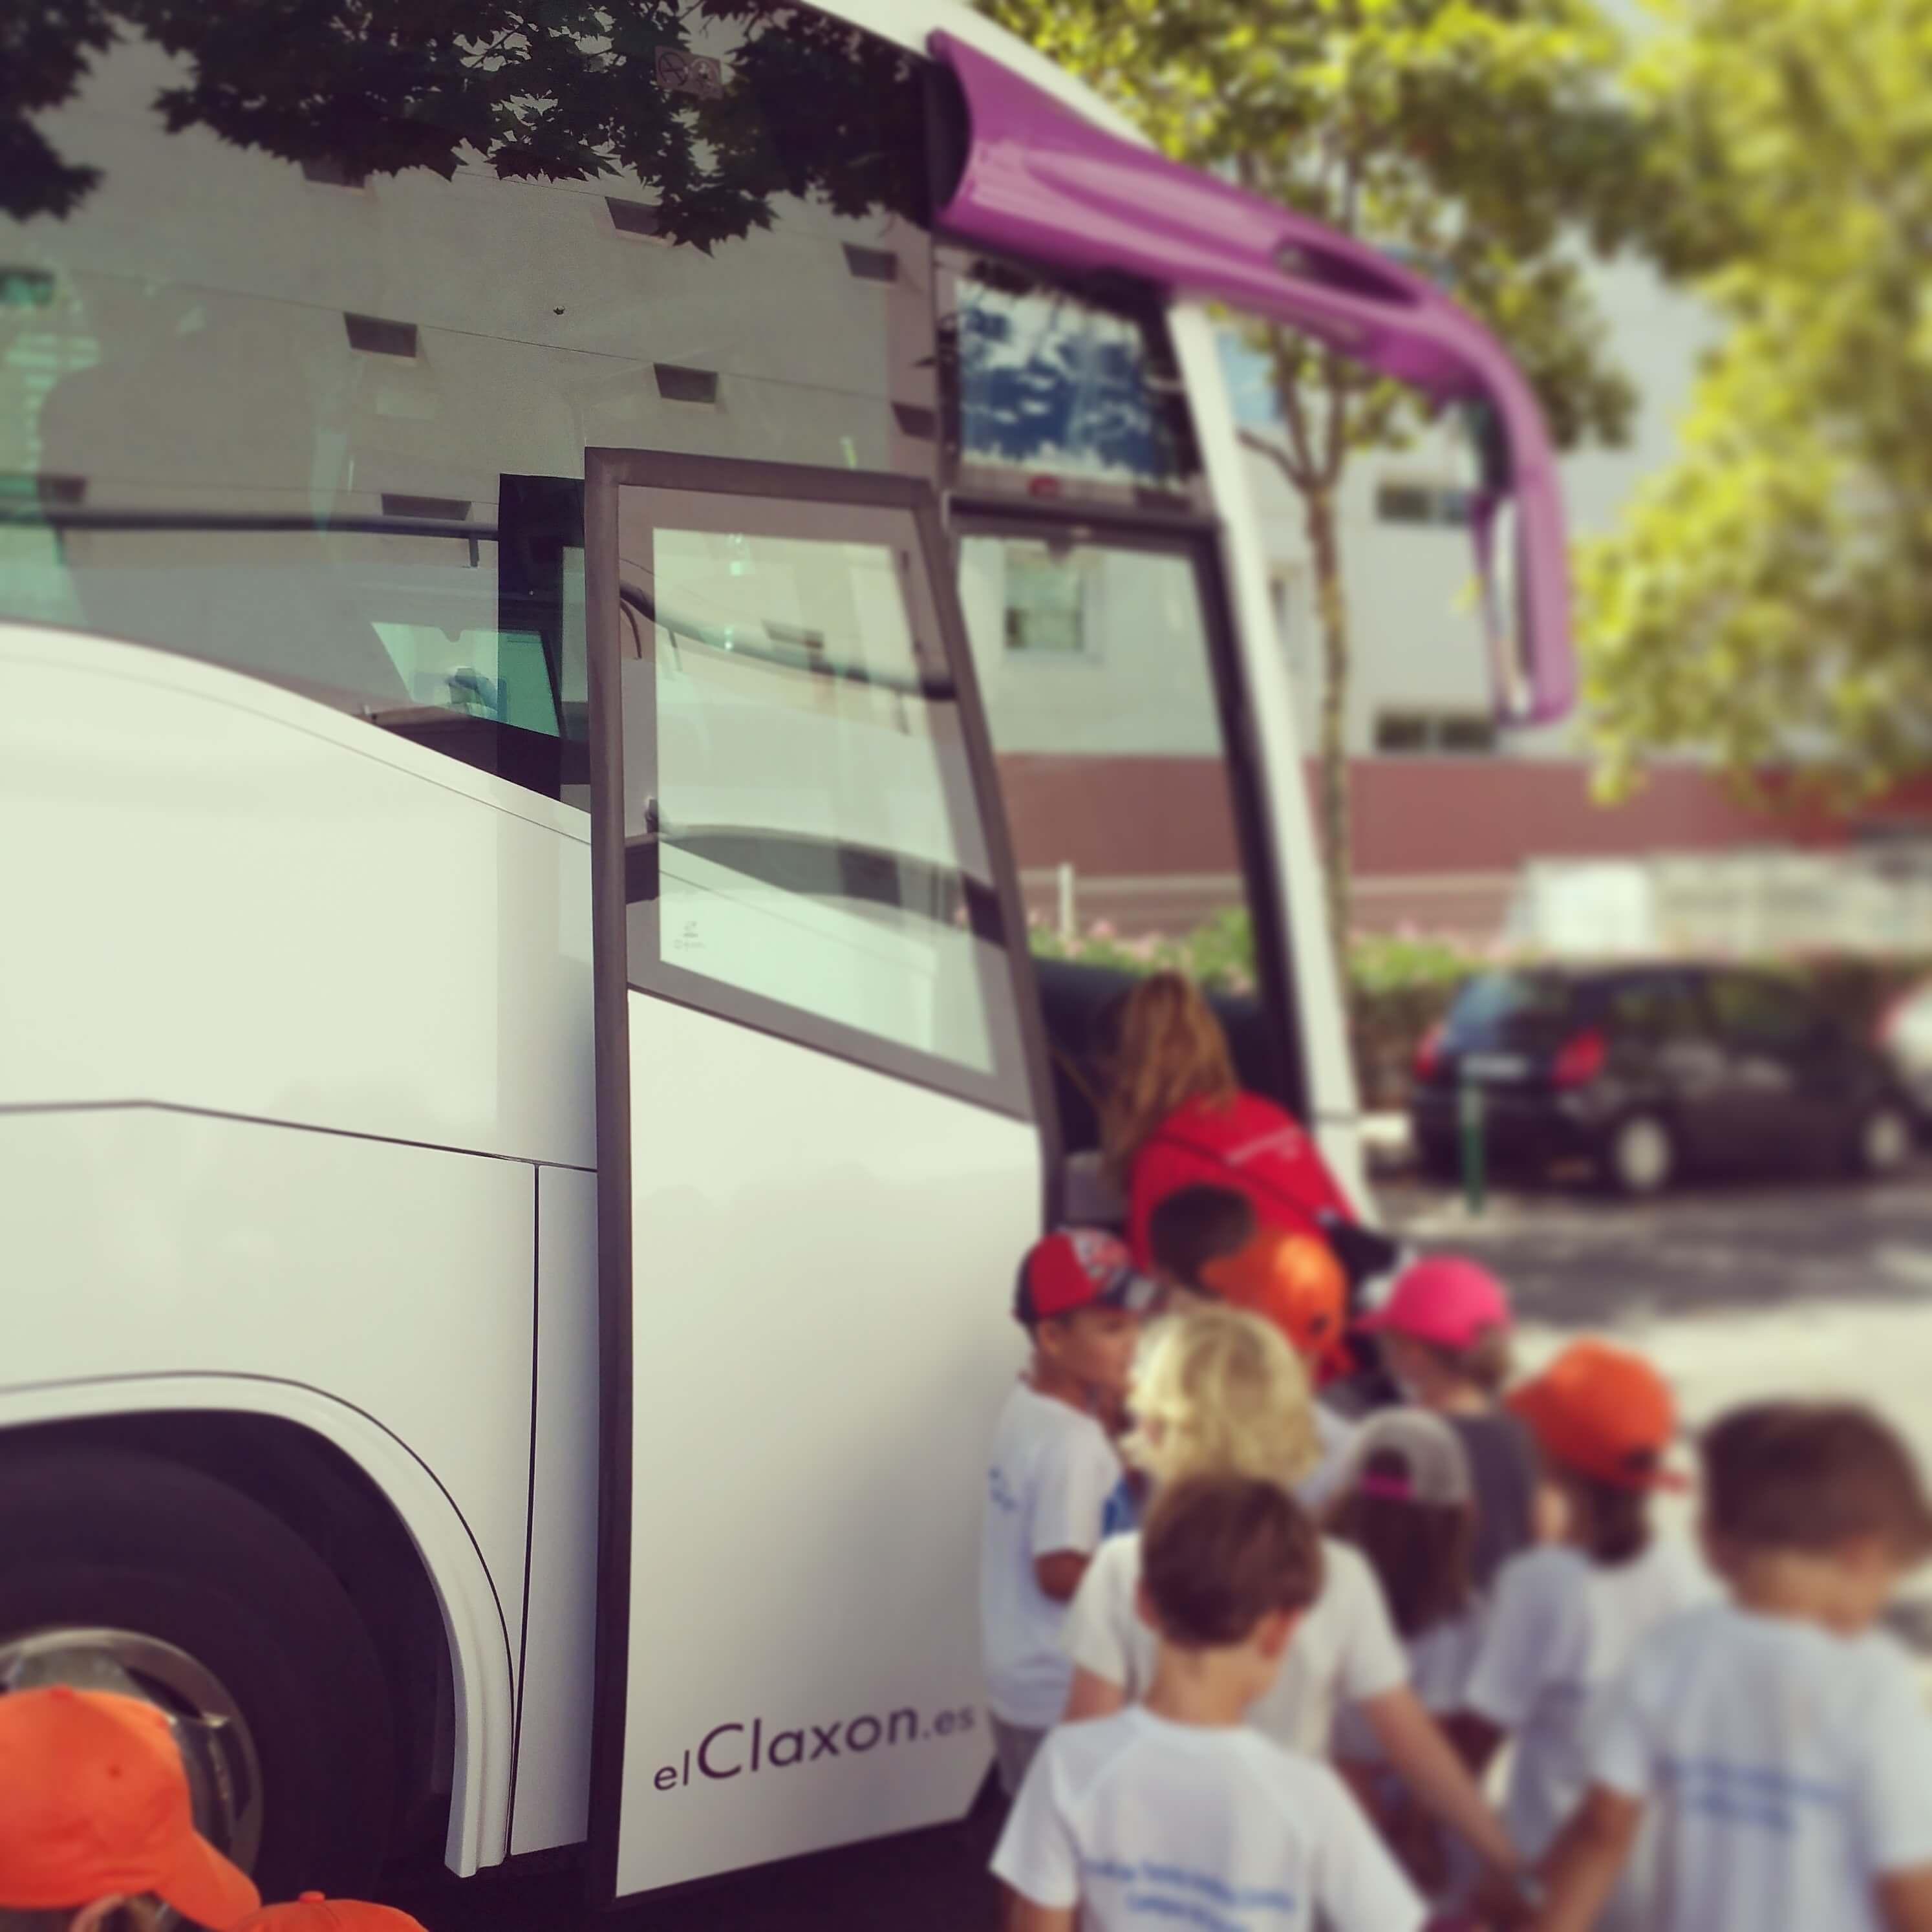 elClaxon Transporte escolar Barcelona